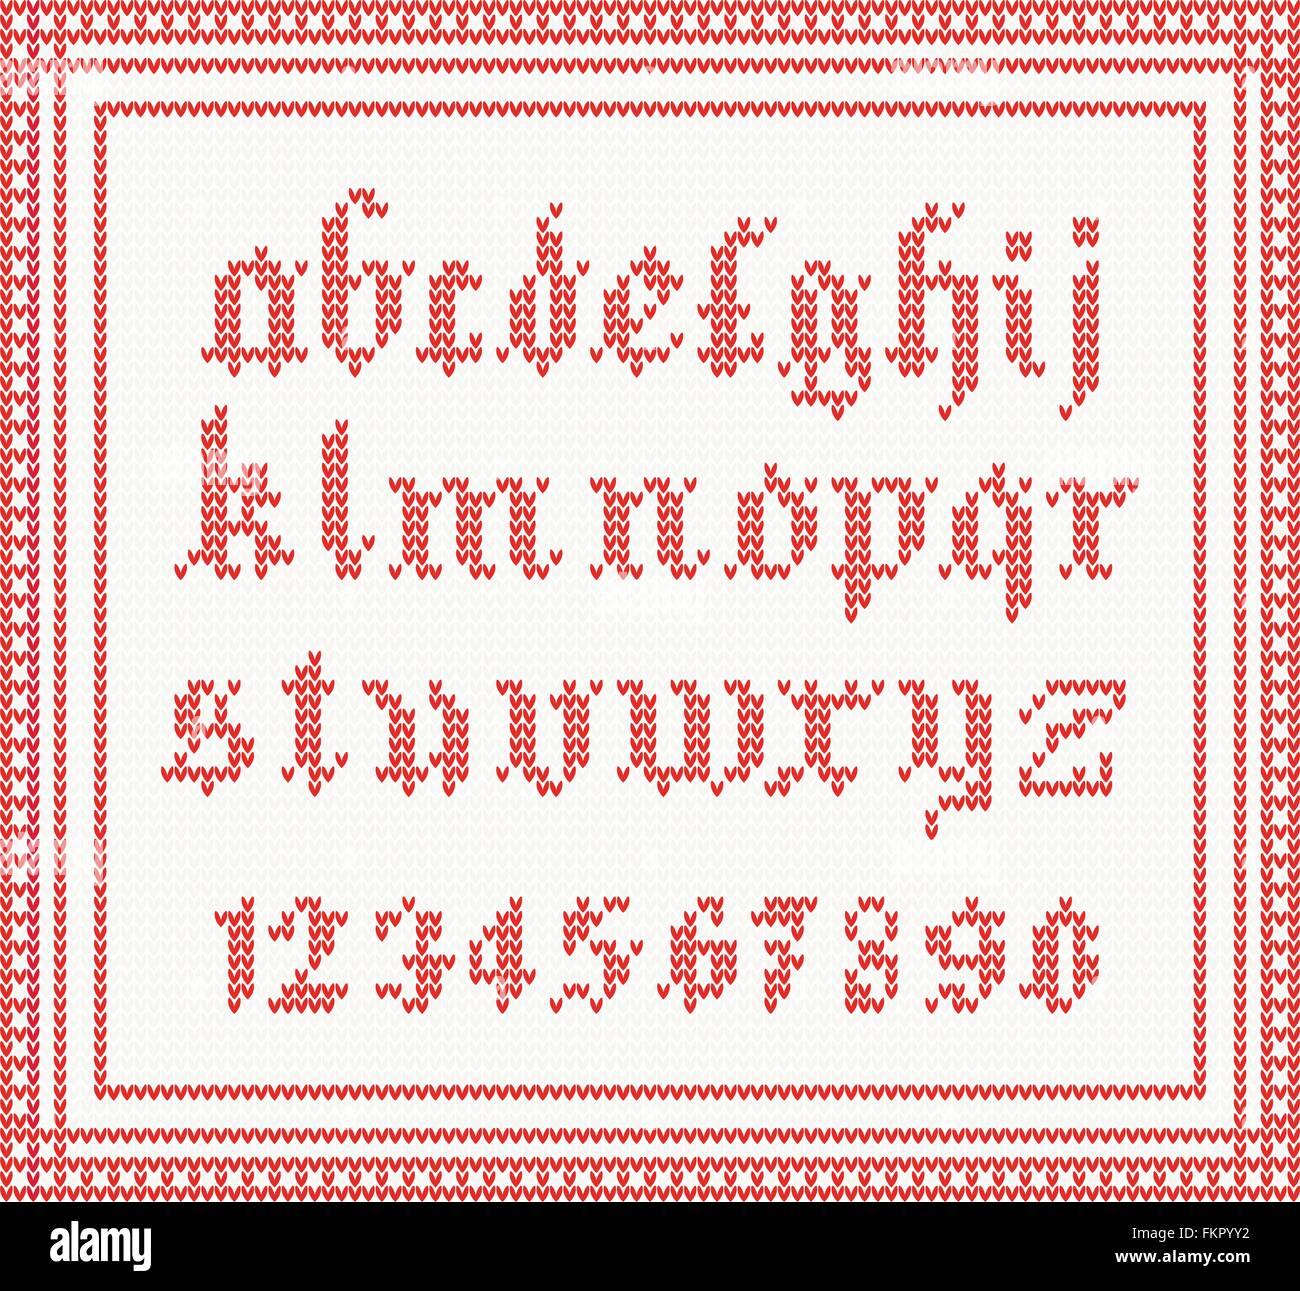 Gothic Alphabet Stock Photos & Gothic Alphabet Stock Images - Alamy